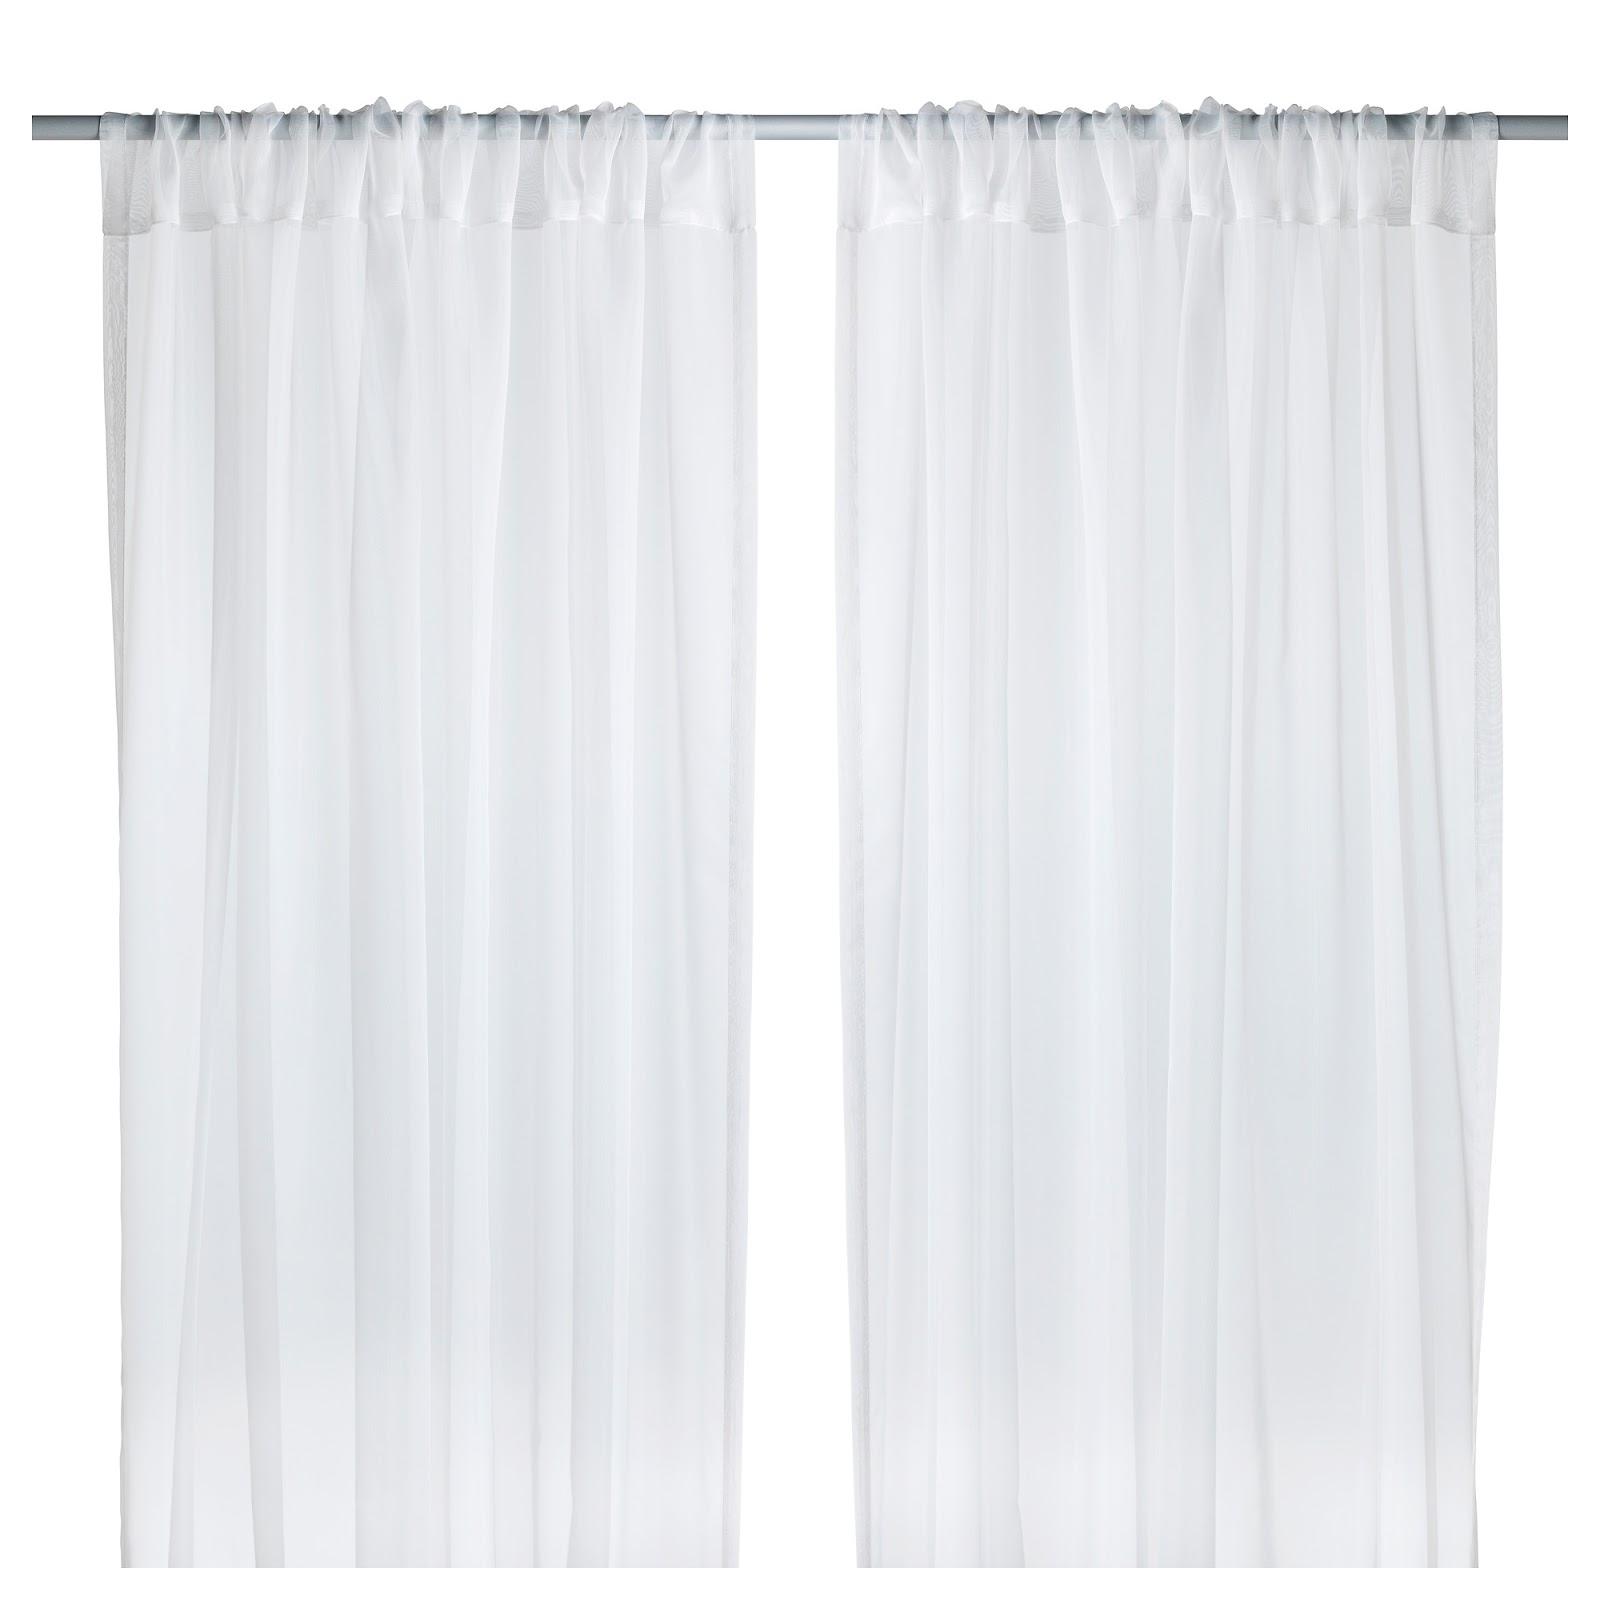 Curtain Headers Heading Designs Styles Tape